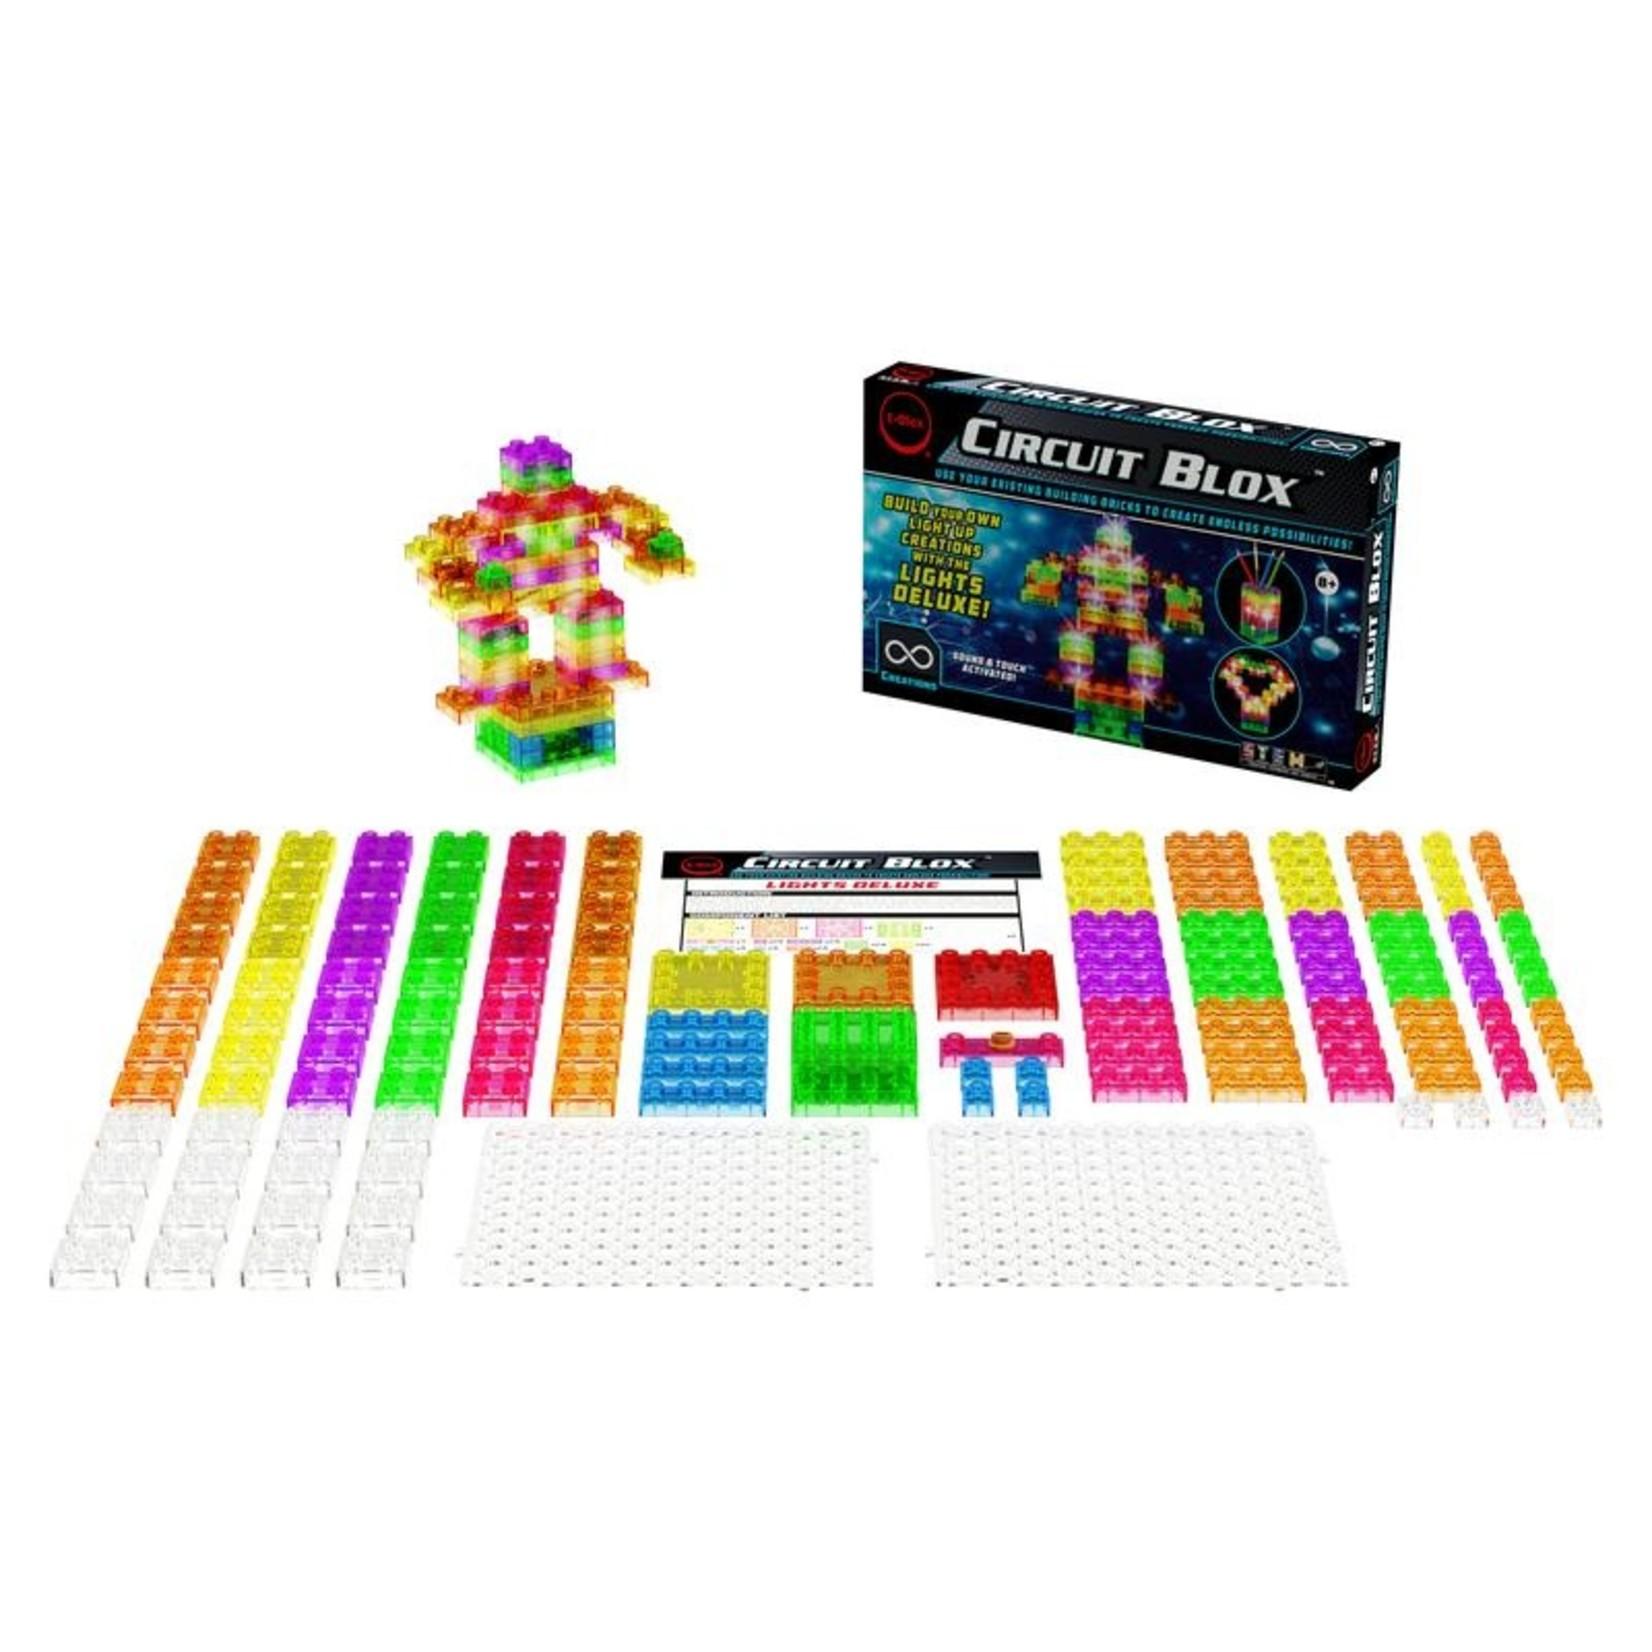 E-Blox Circuit Blox - Deluxe